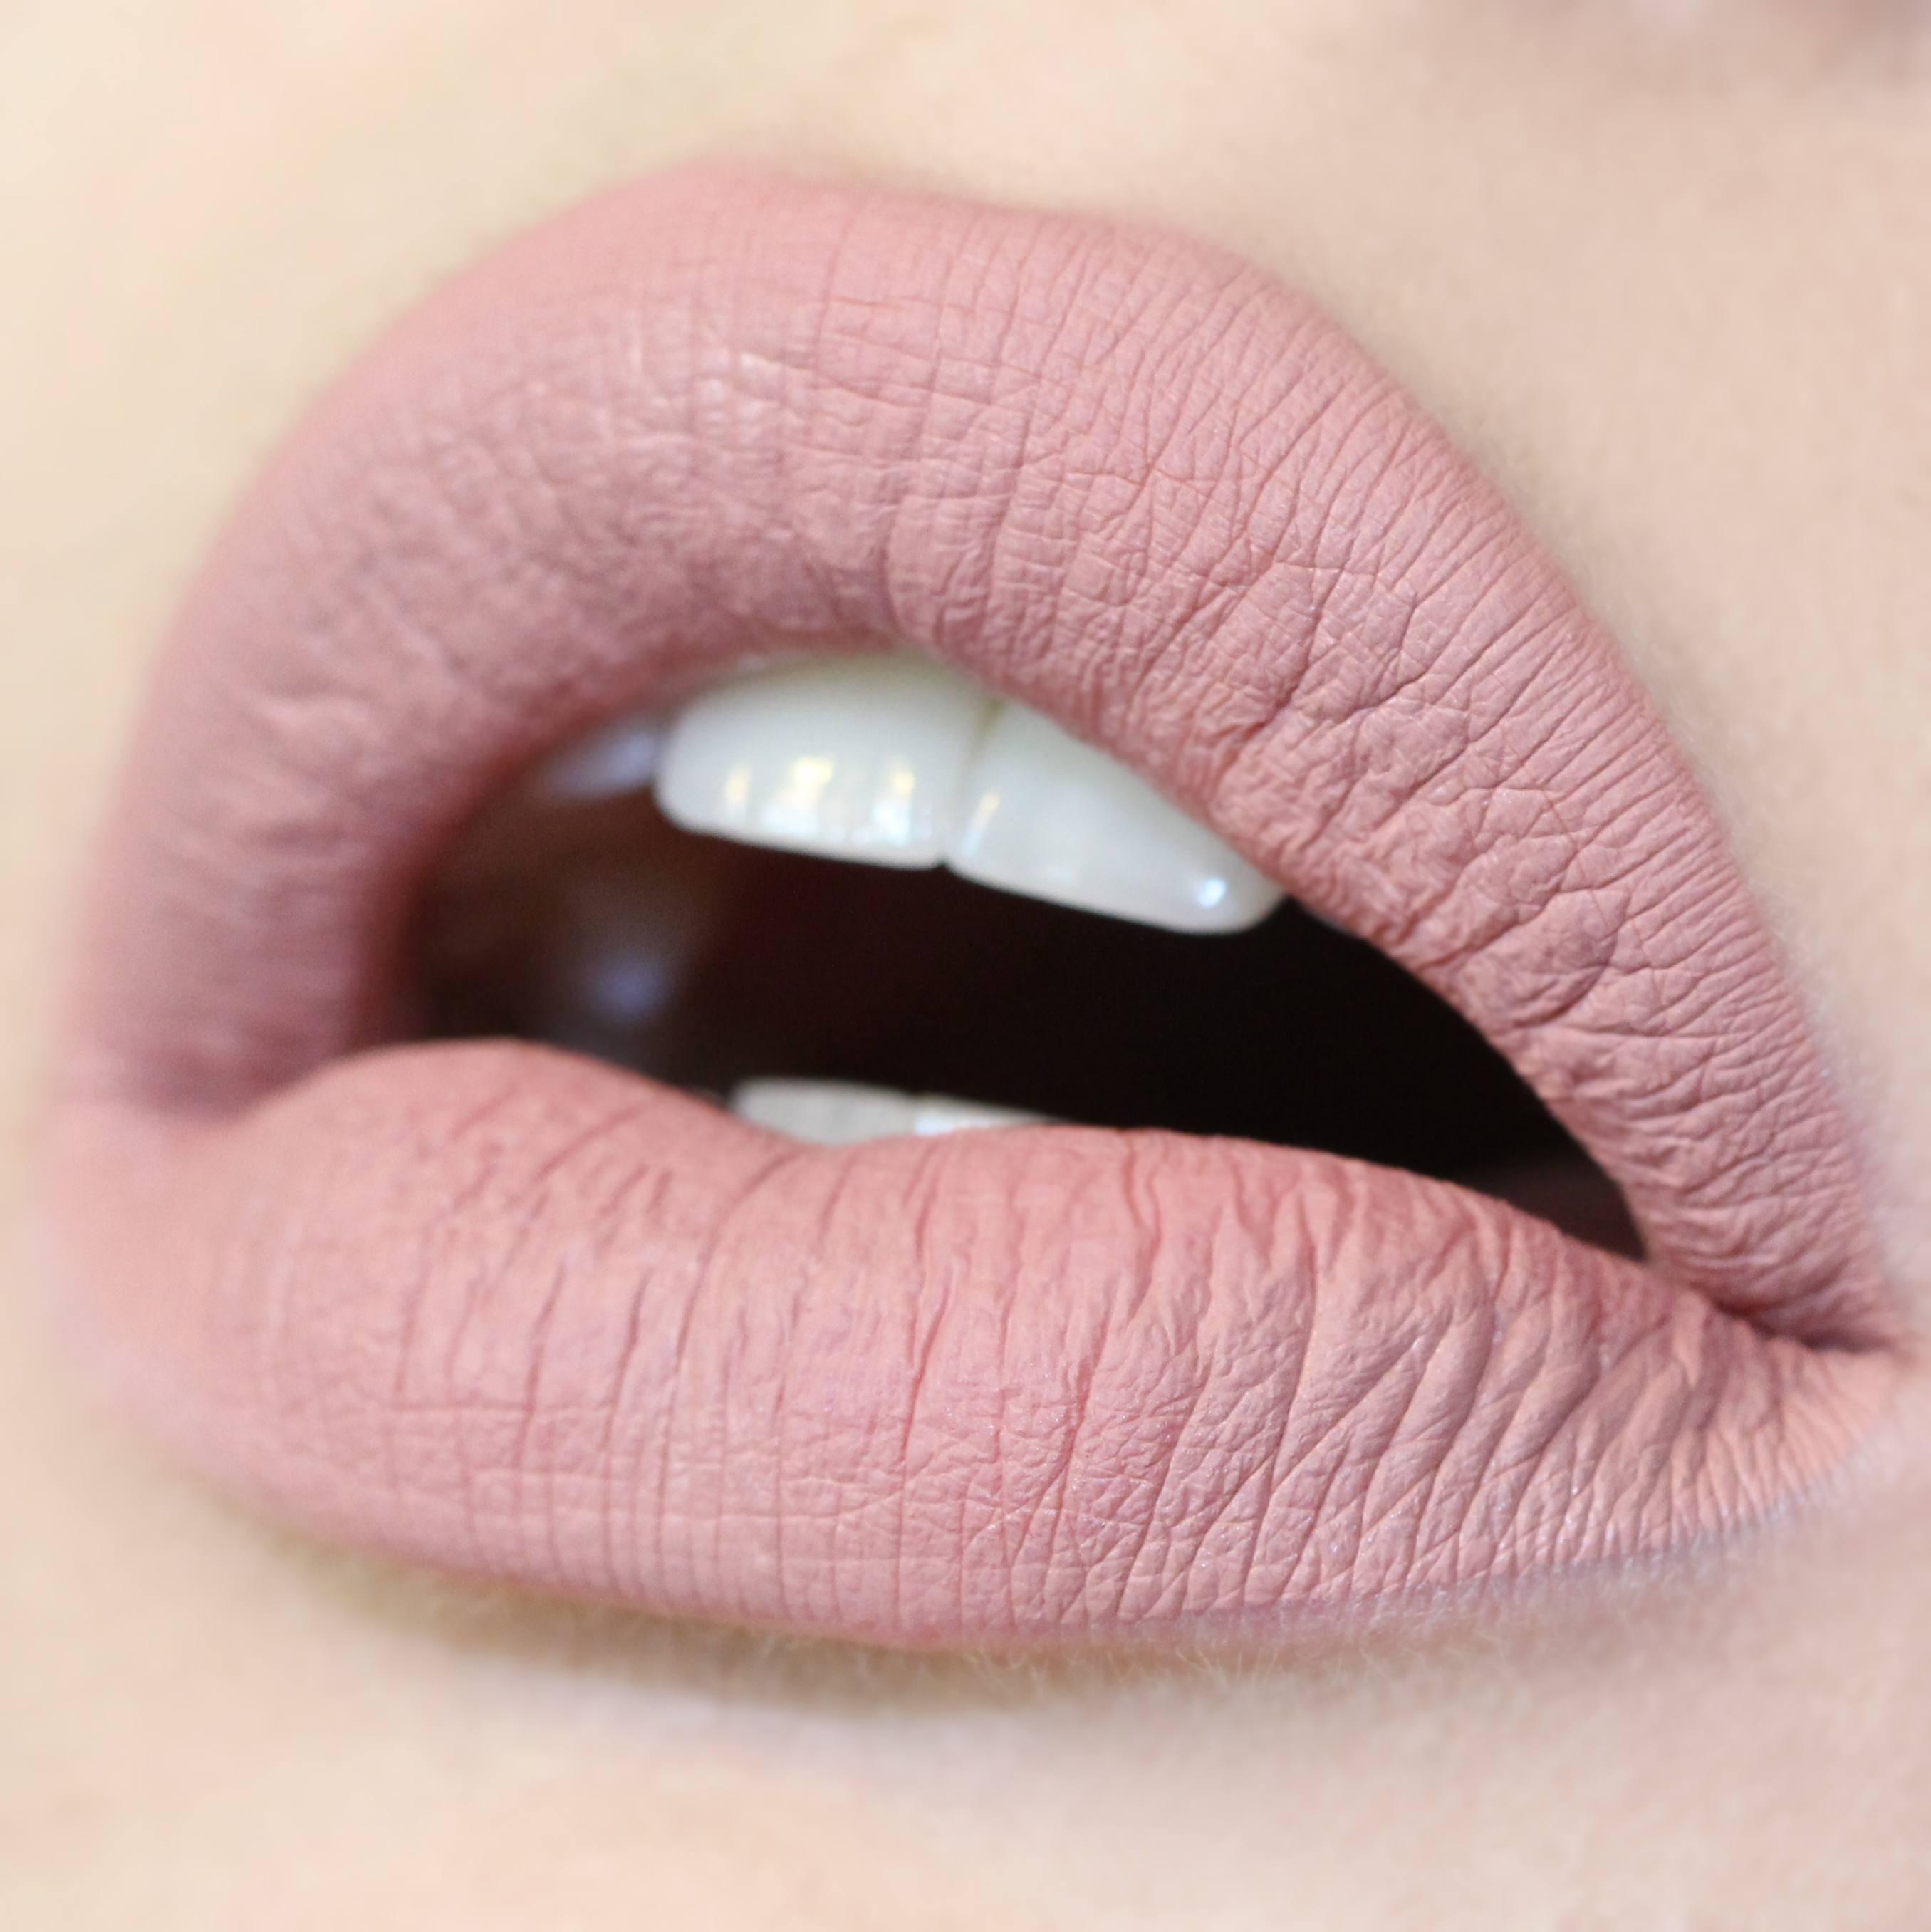 colourpop ultra matte lip สี midi